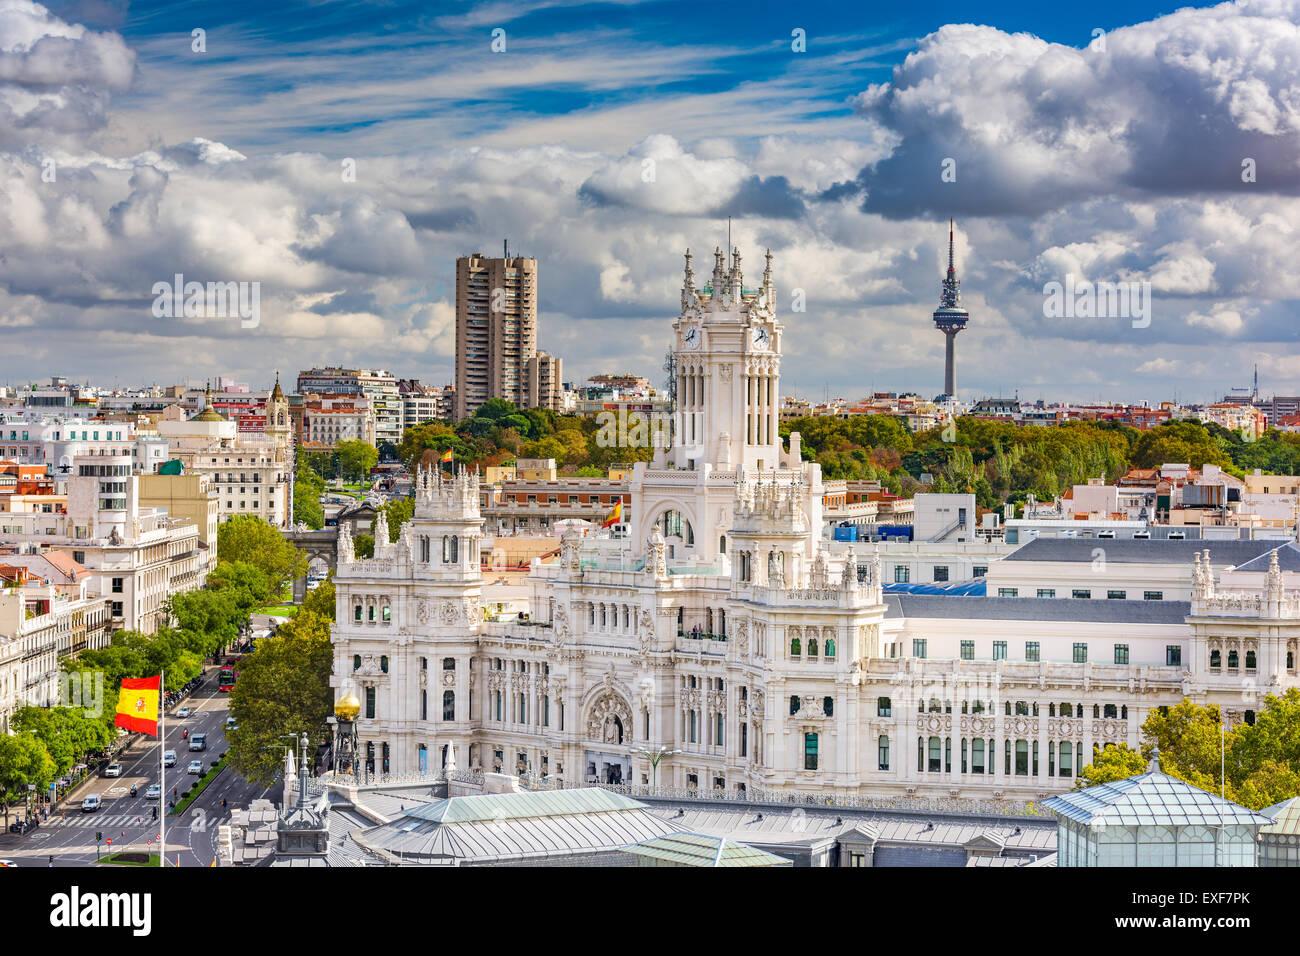 Madrid, Spanien Stadtbild mit Kommunikation Palast und Torrespana Turm. Stockbild